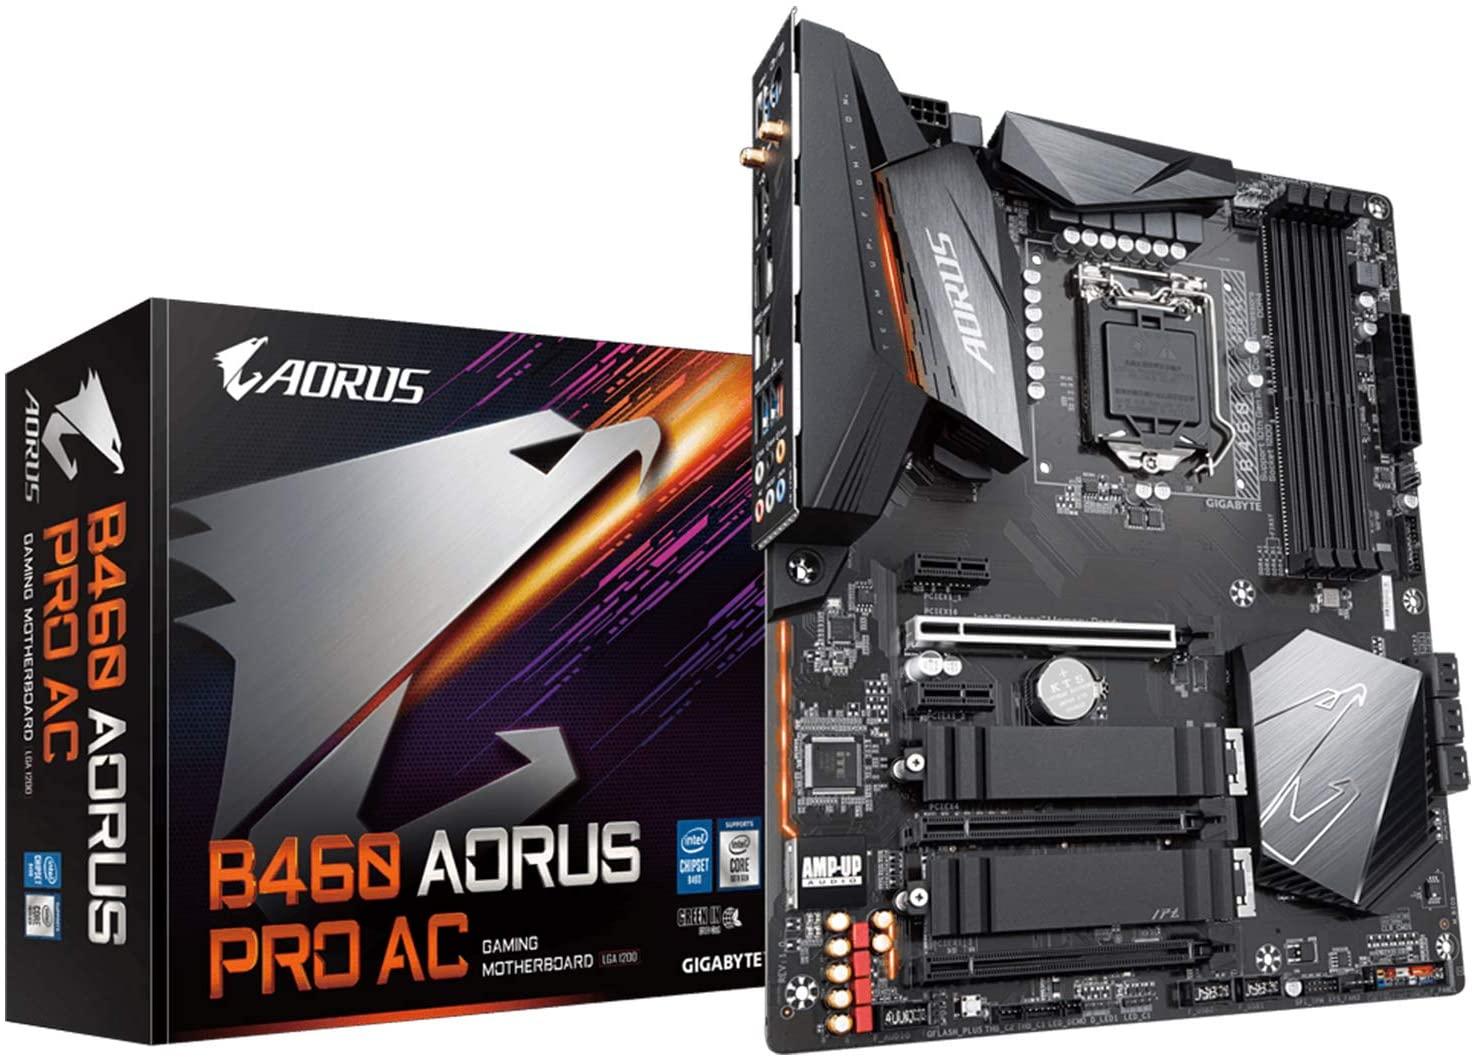 Placa mãe B460 Aorus Pro AC intel LGA1200 Atx ddr4 Gigabyte 1200 Wifi